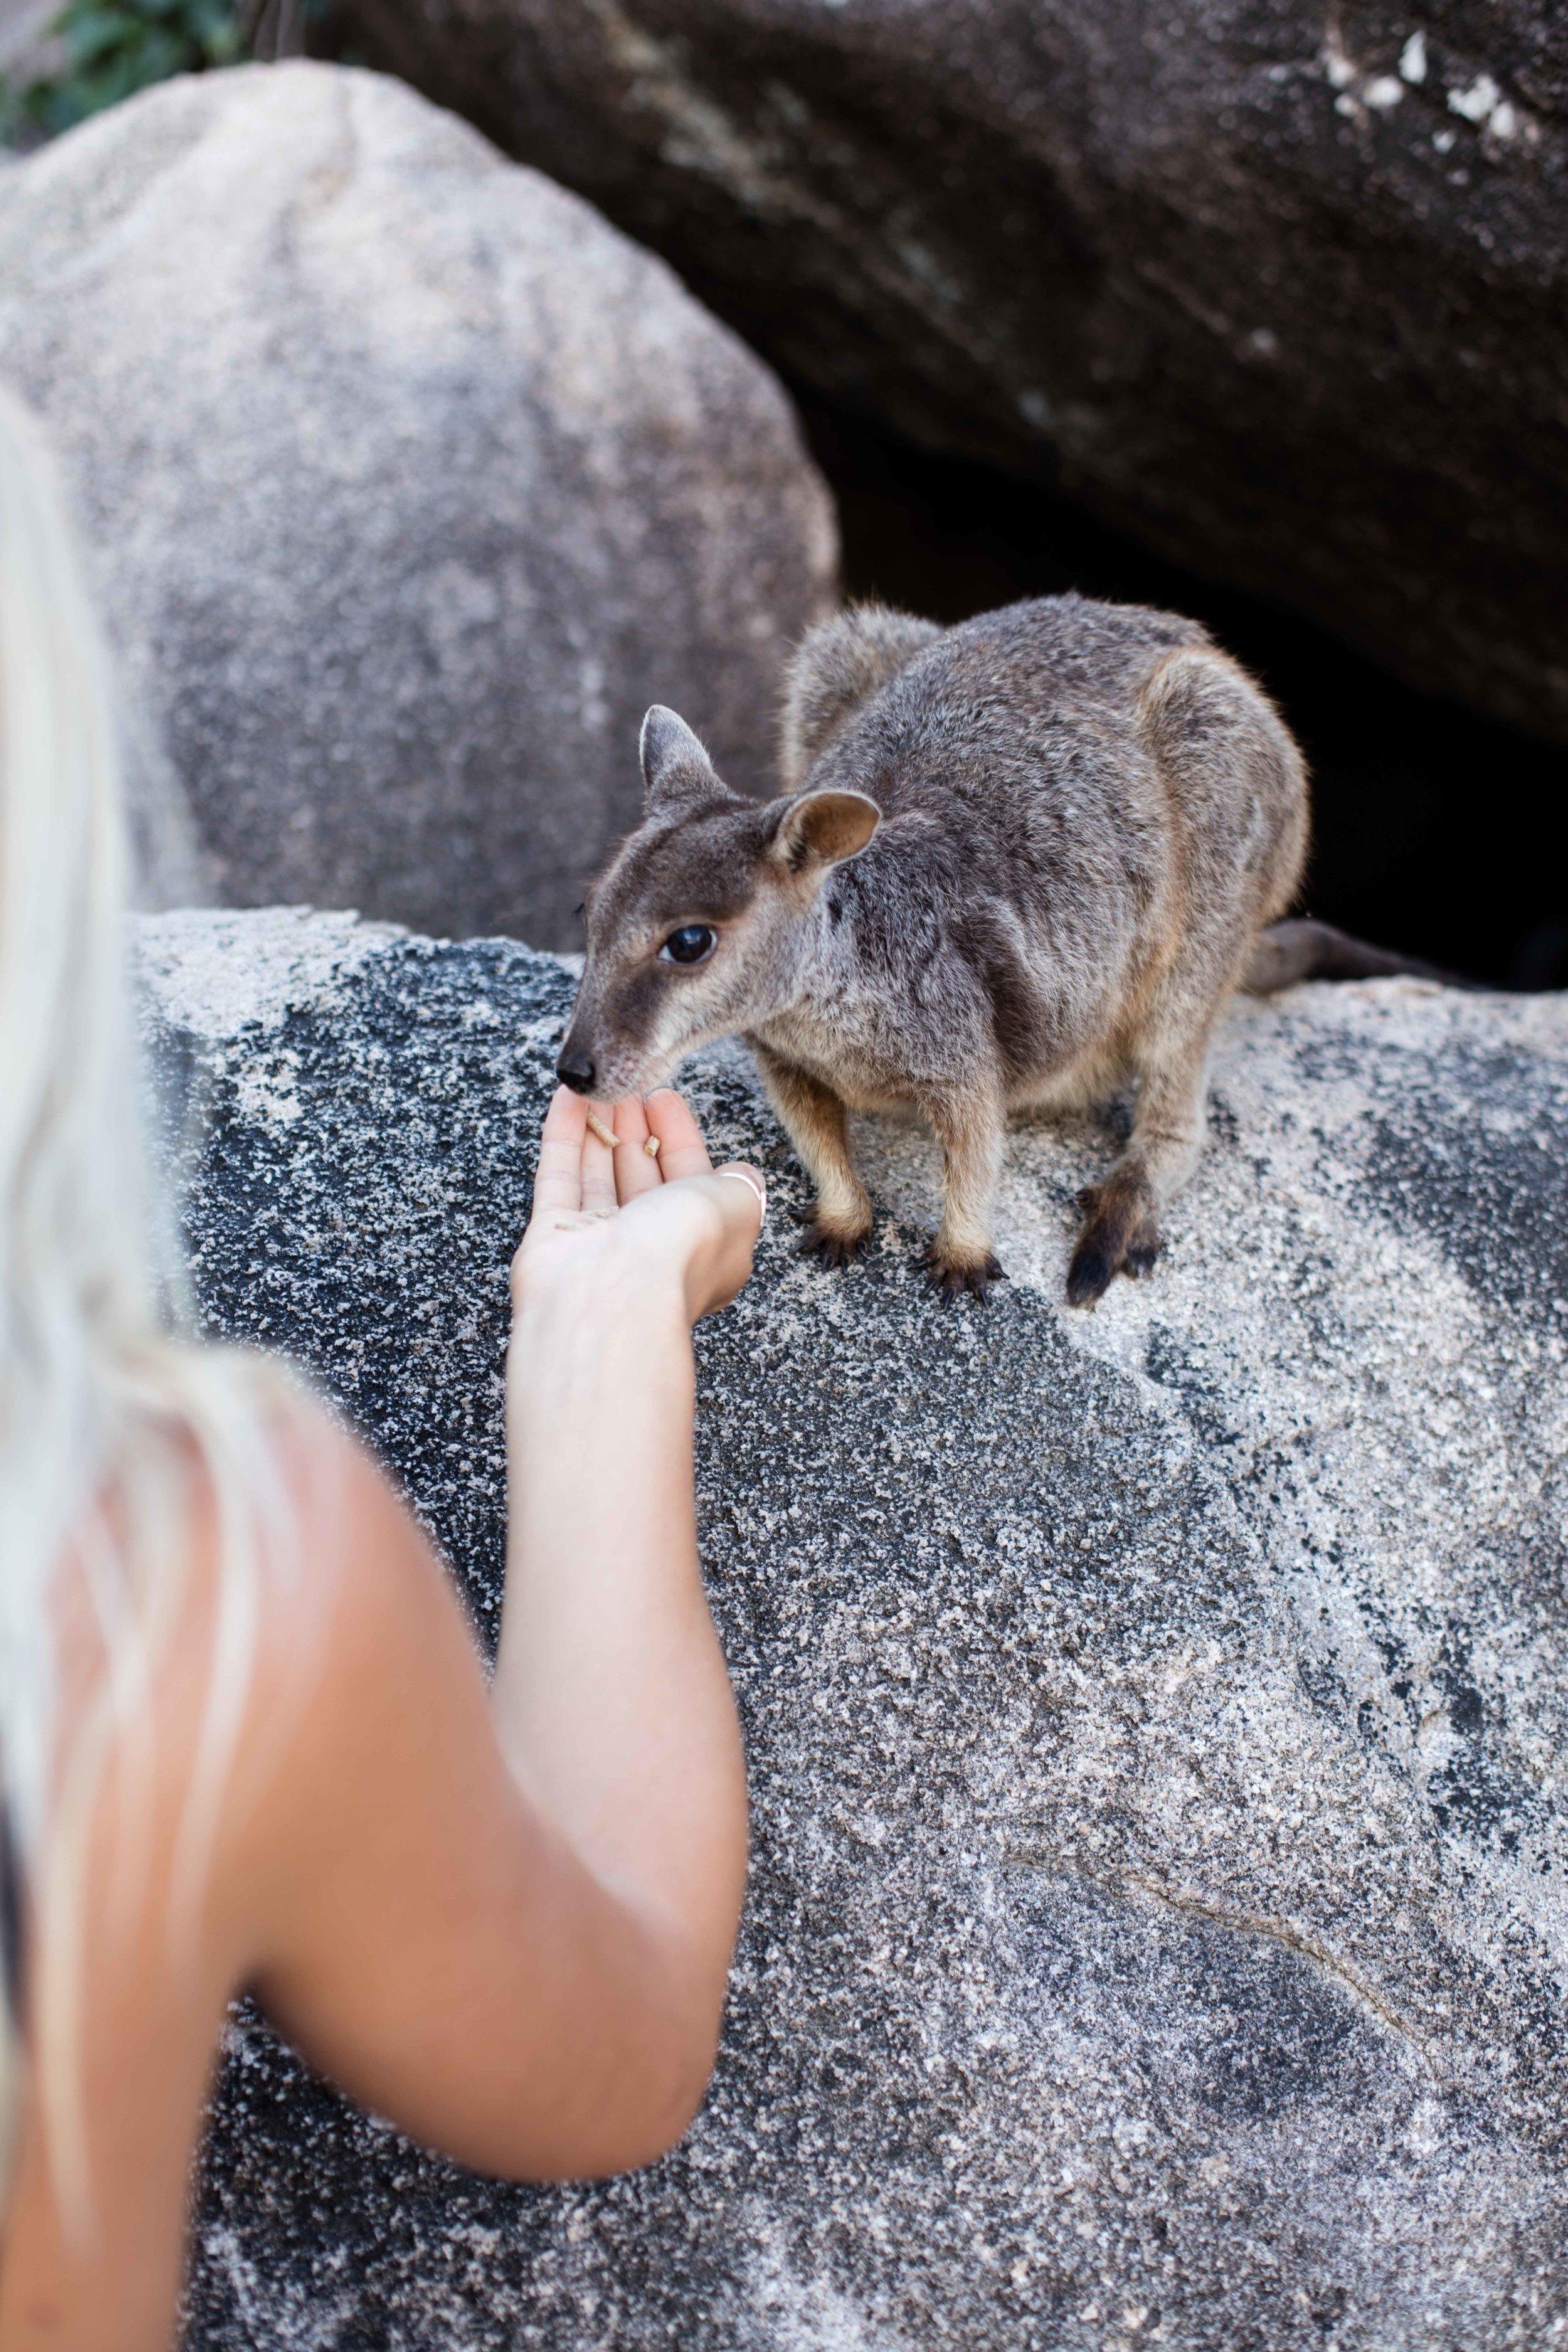 Feeding the local Rock Wallabies